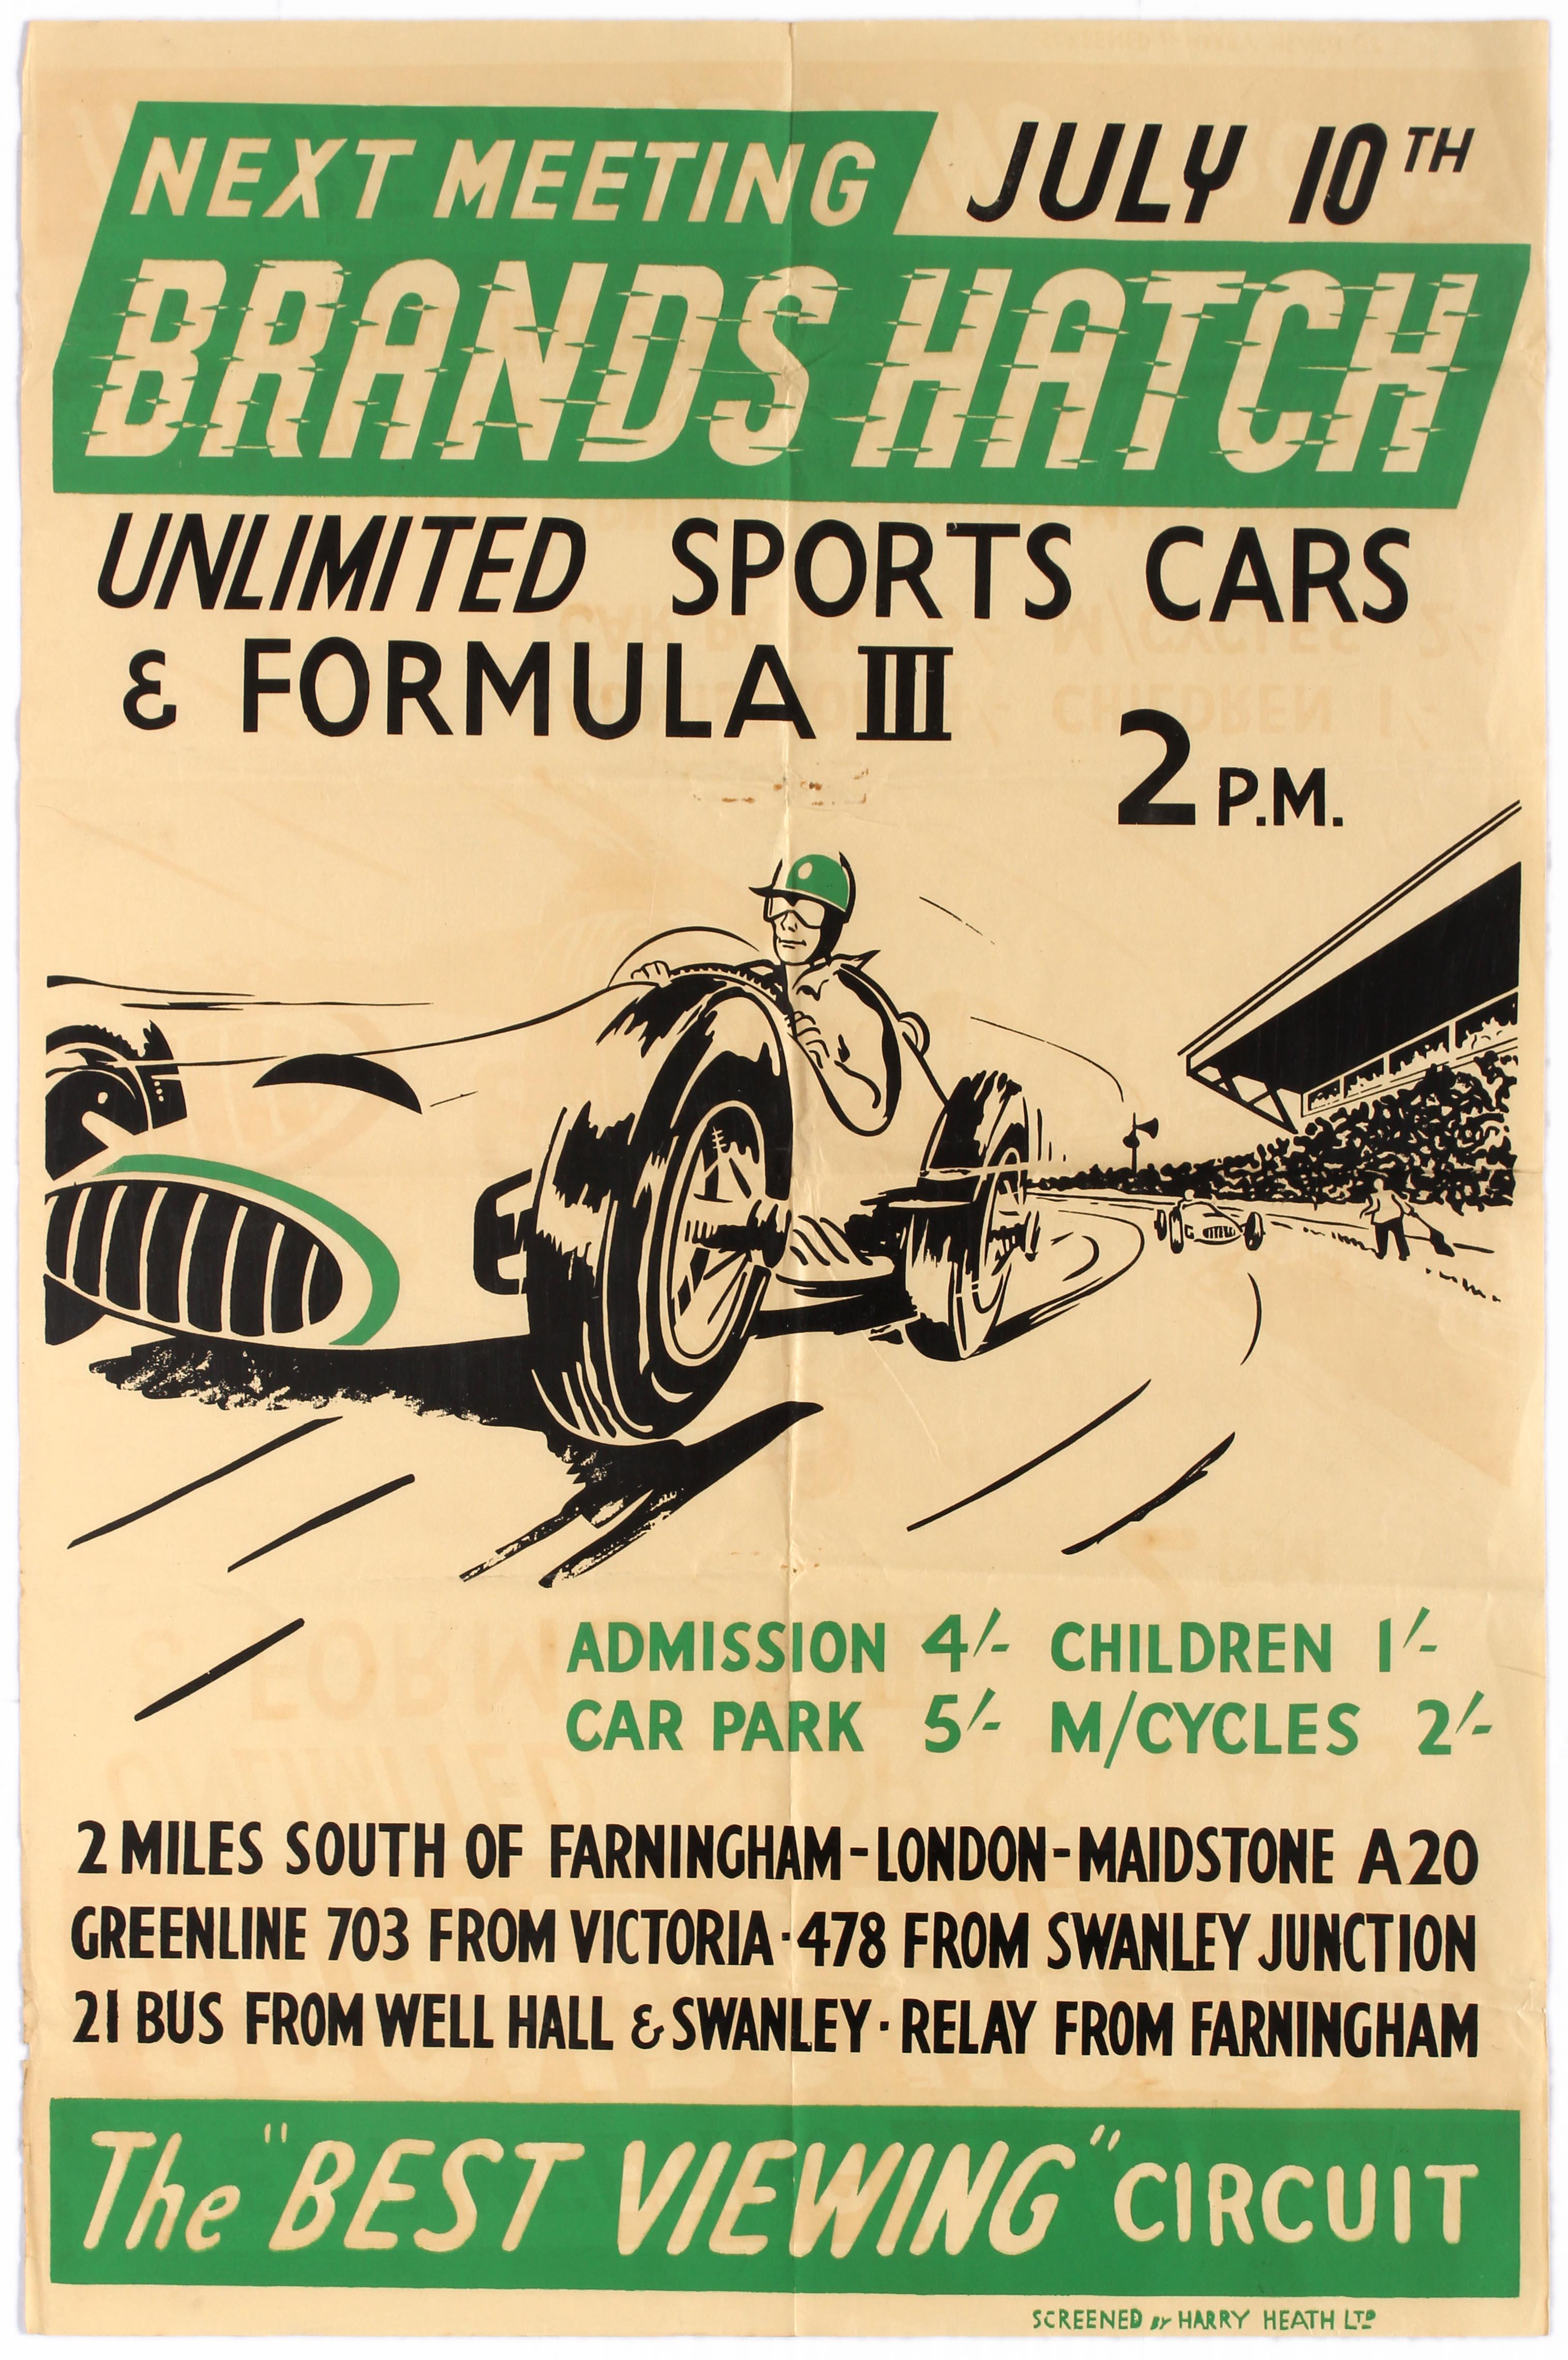 Sport Poster Brands Hatch Unlimited Sports Car Racing Formula 3